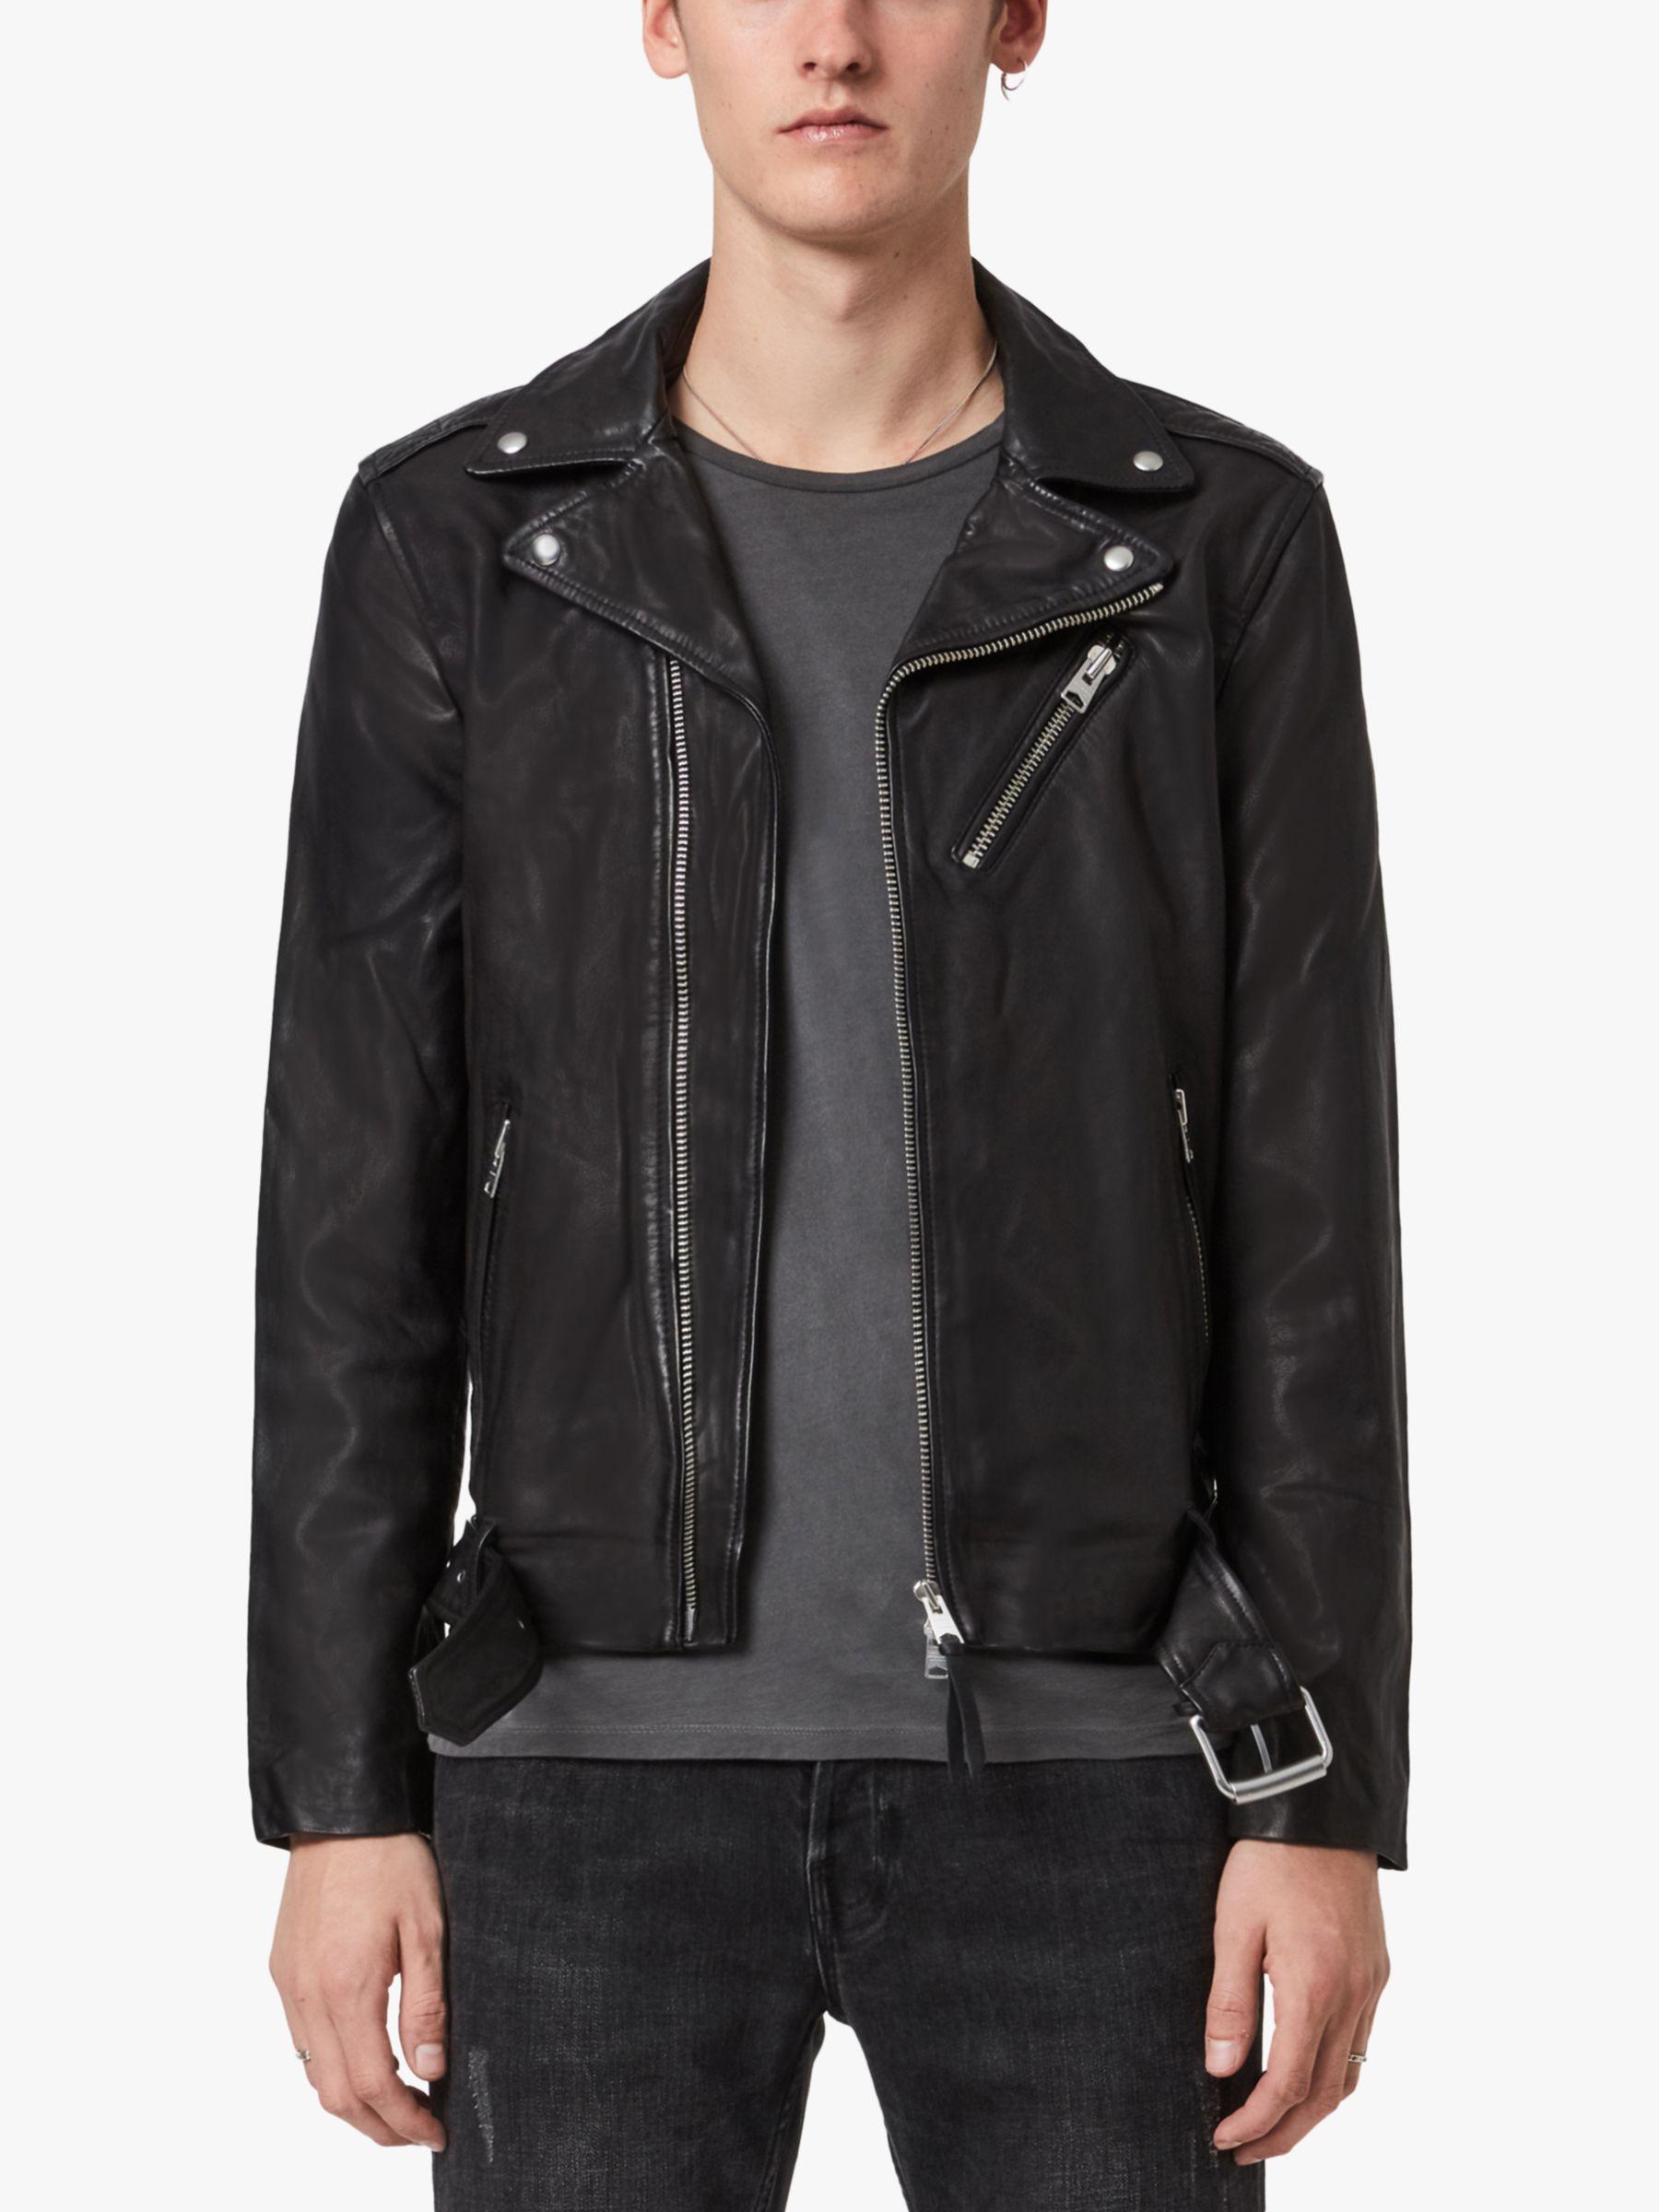 AllSaints AllSaints Riggs Biker Jacket, Black